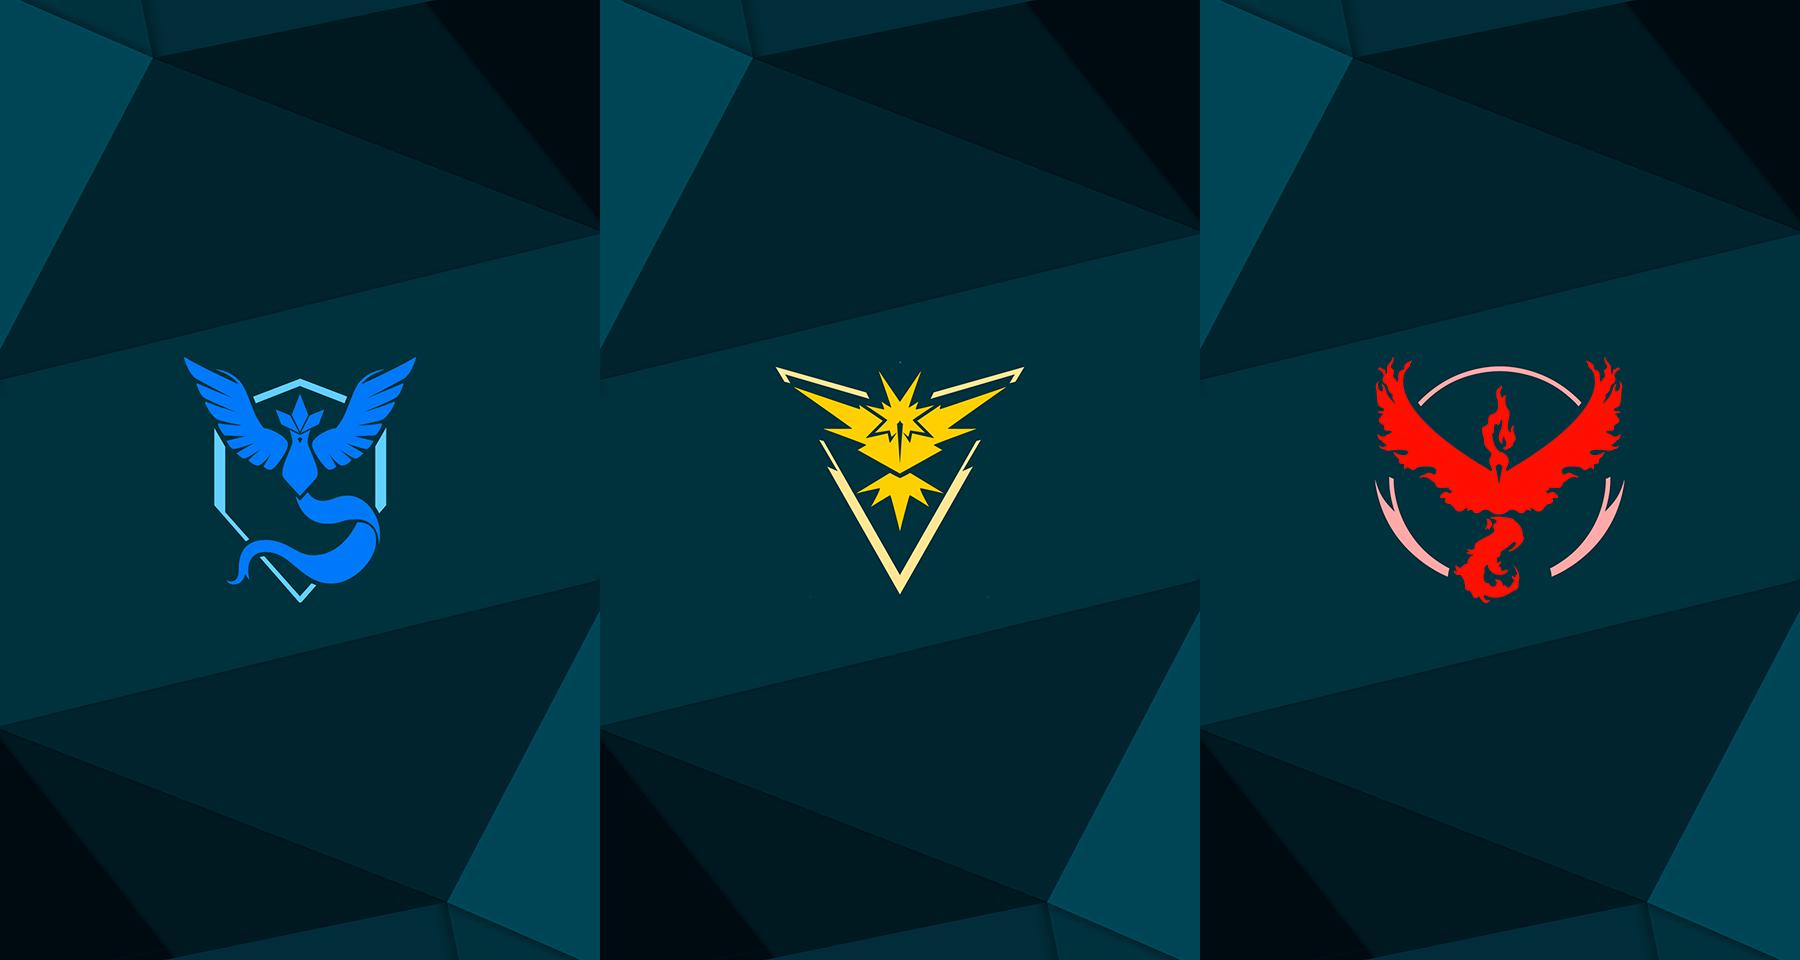 Pokemon Go Teams Wallpaper Pack By Malexer On Deviantart